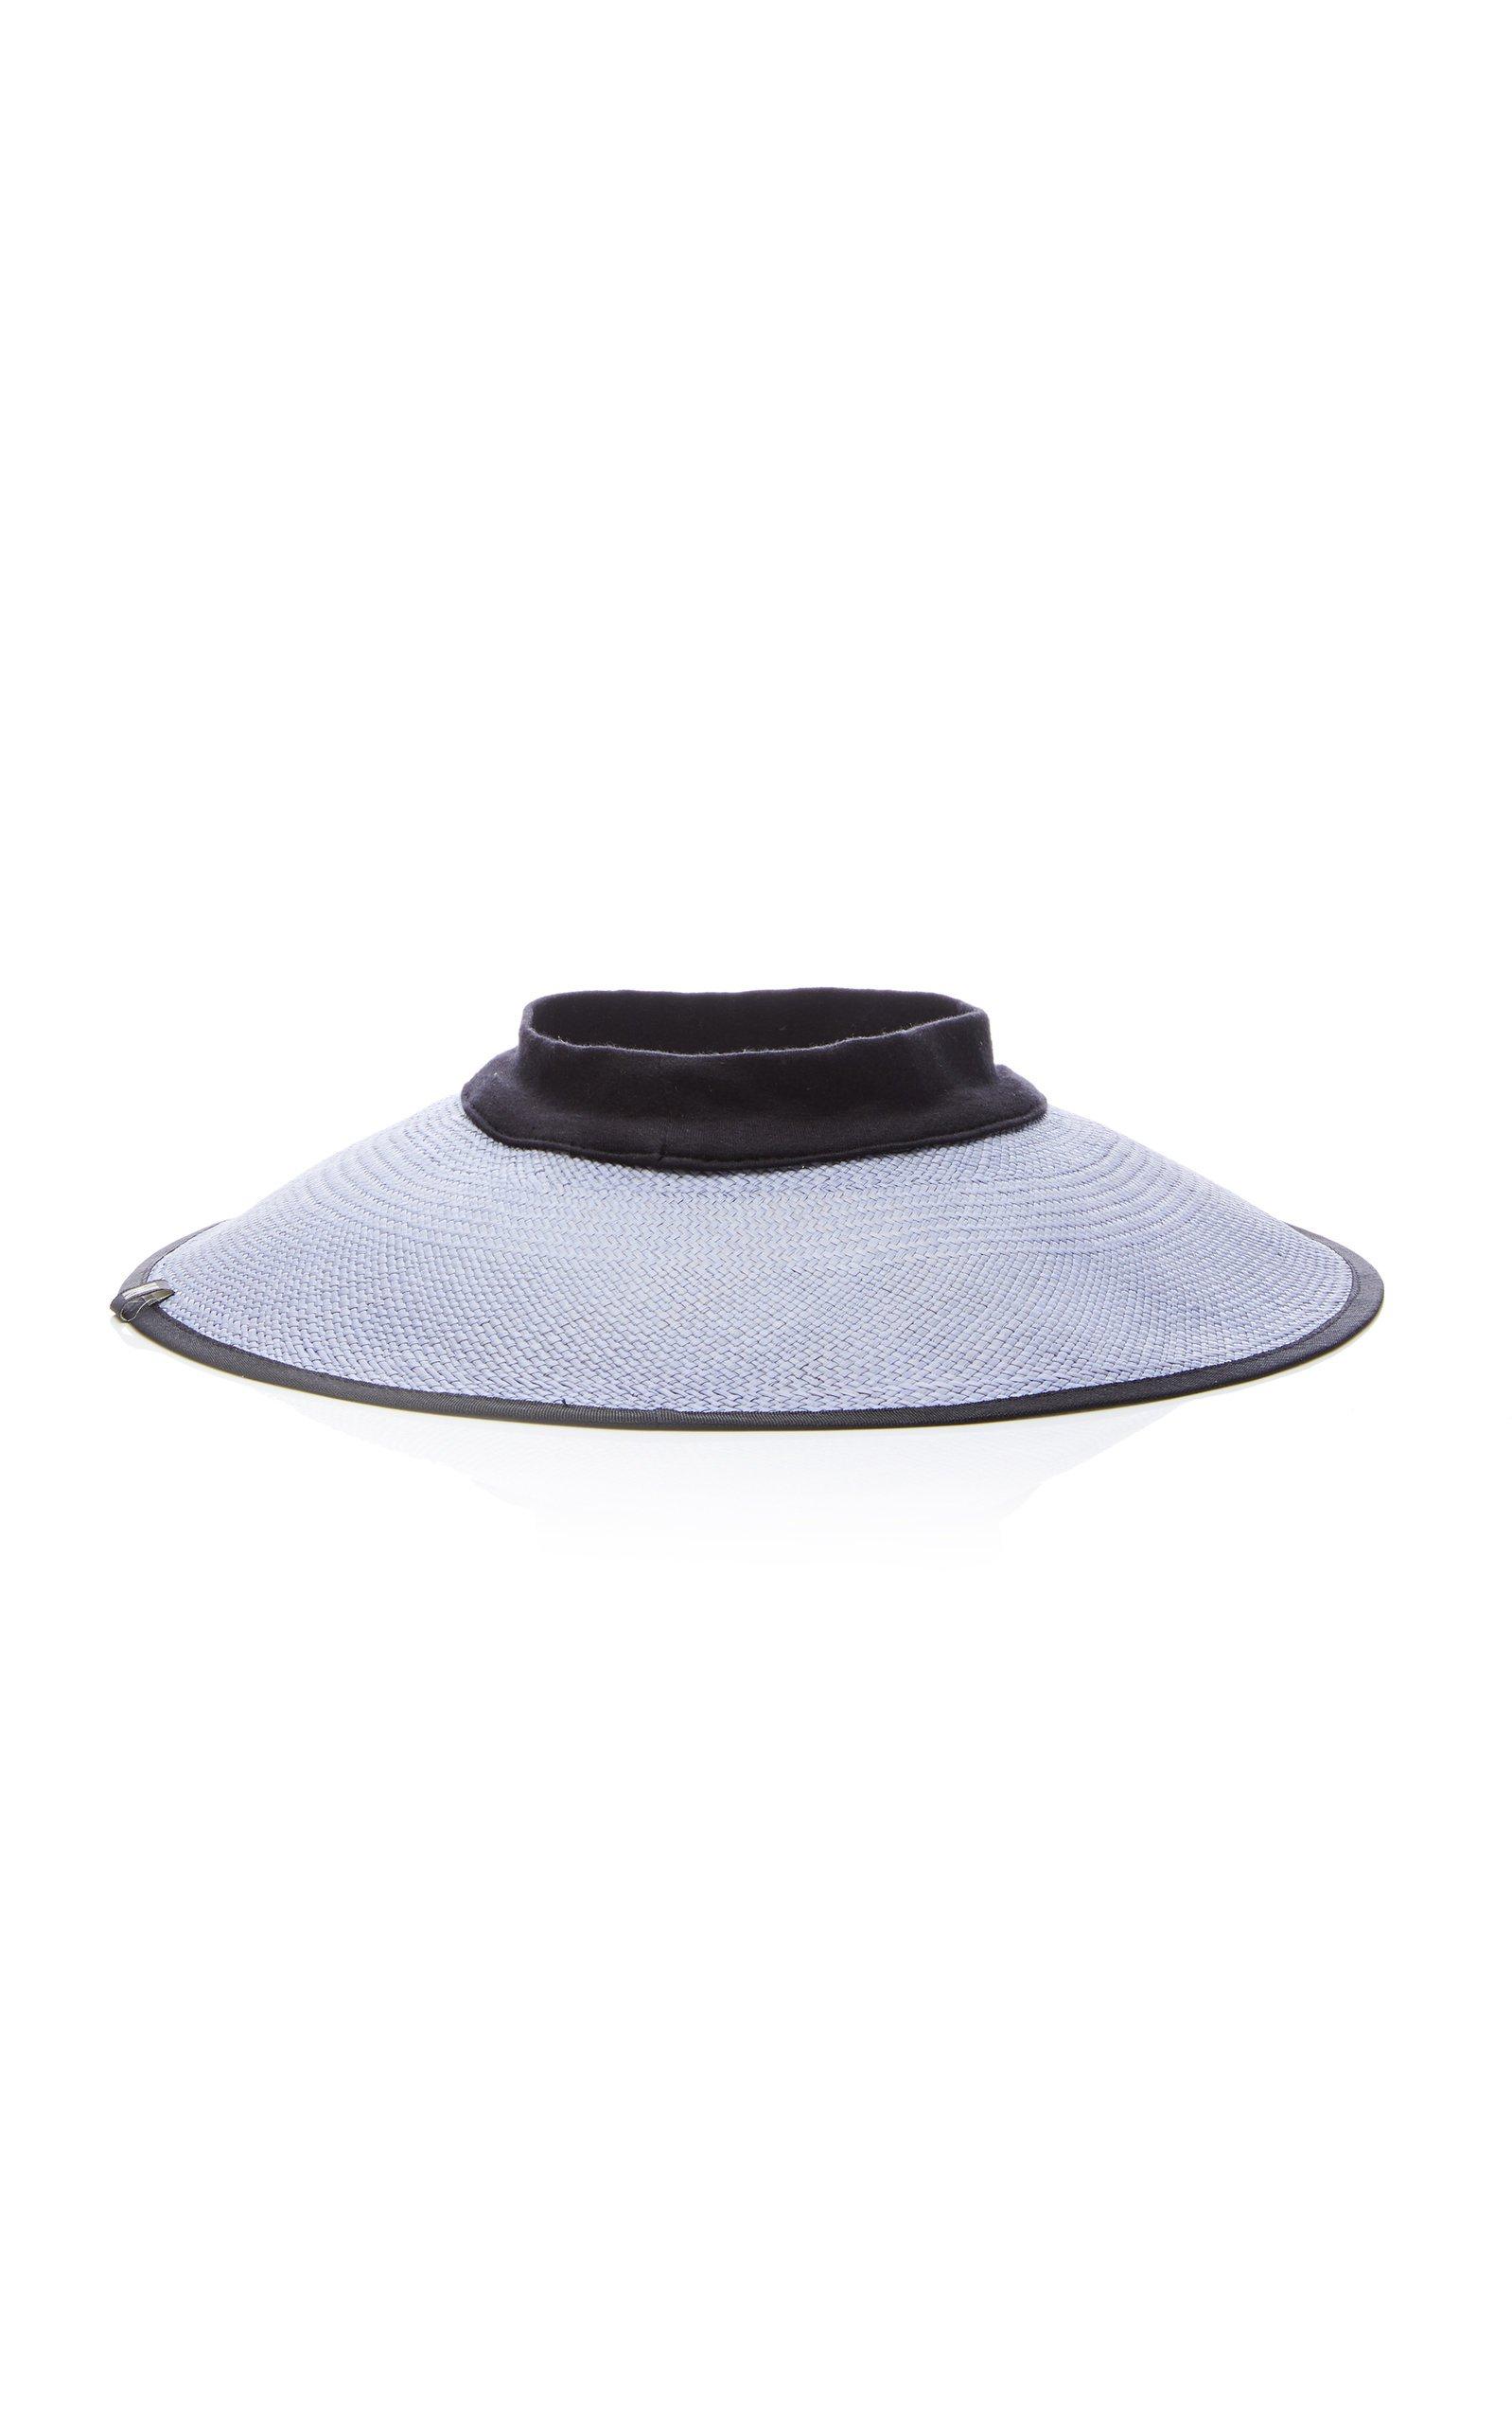 Nannacay Akele Open Top Woven Raffia Hat